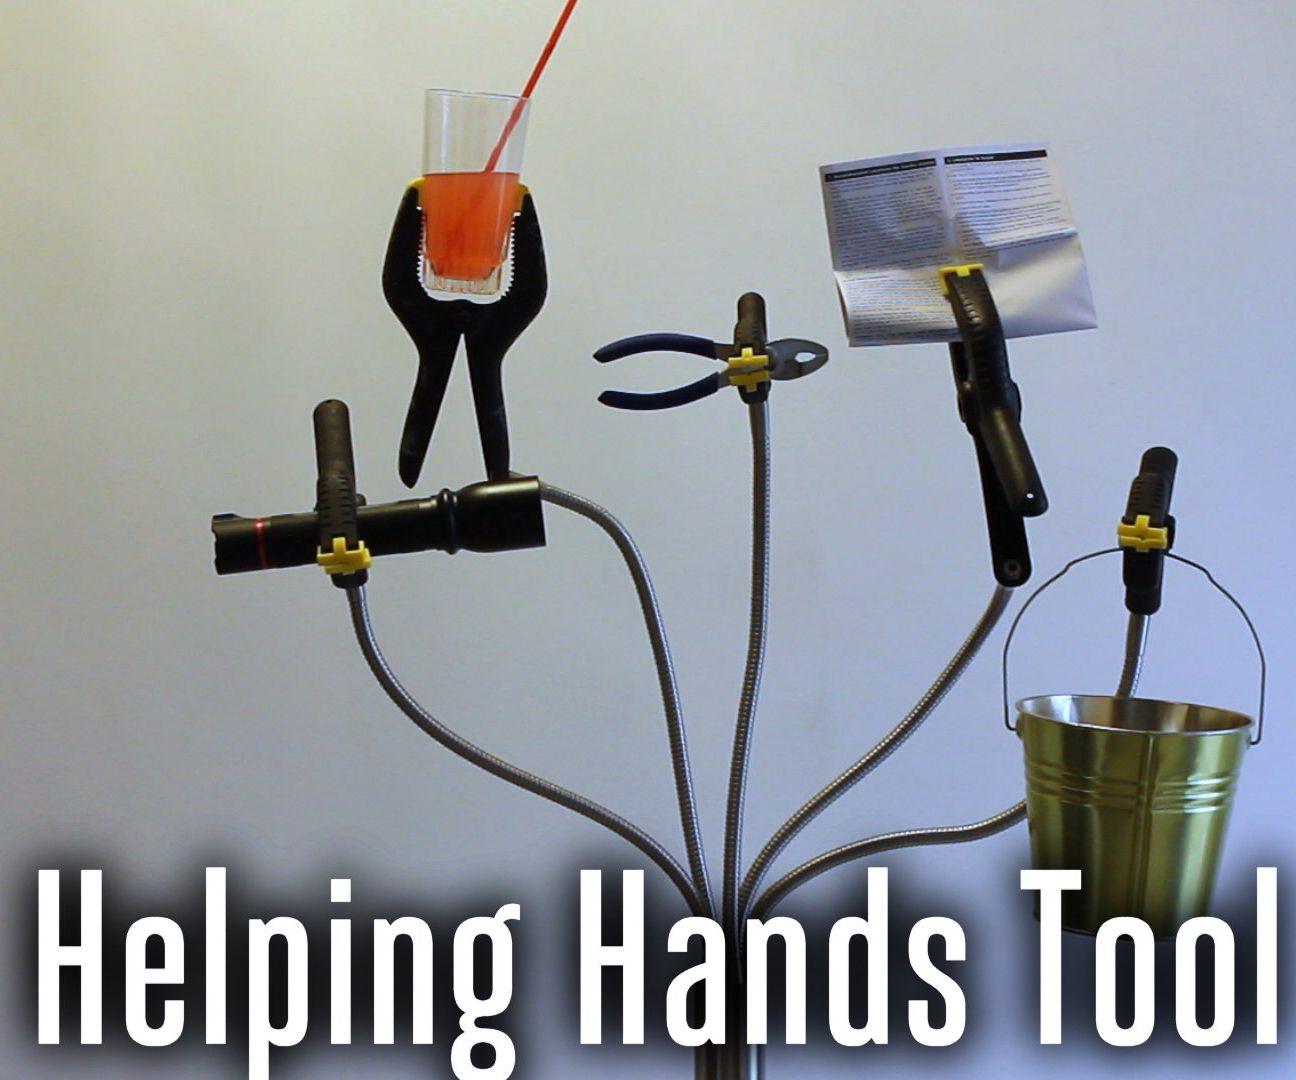 Heavy Duty Helping Hands Tool